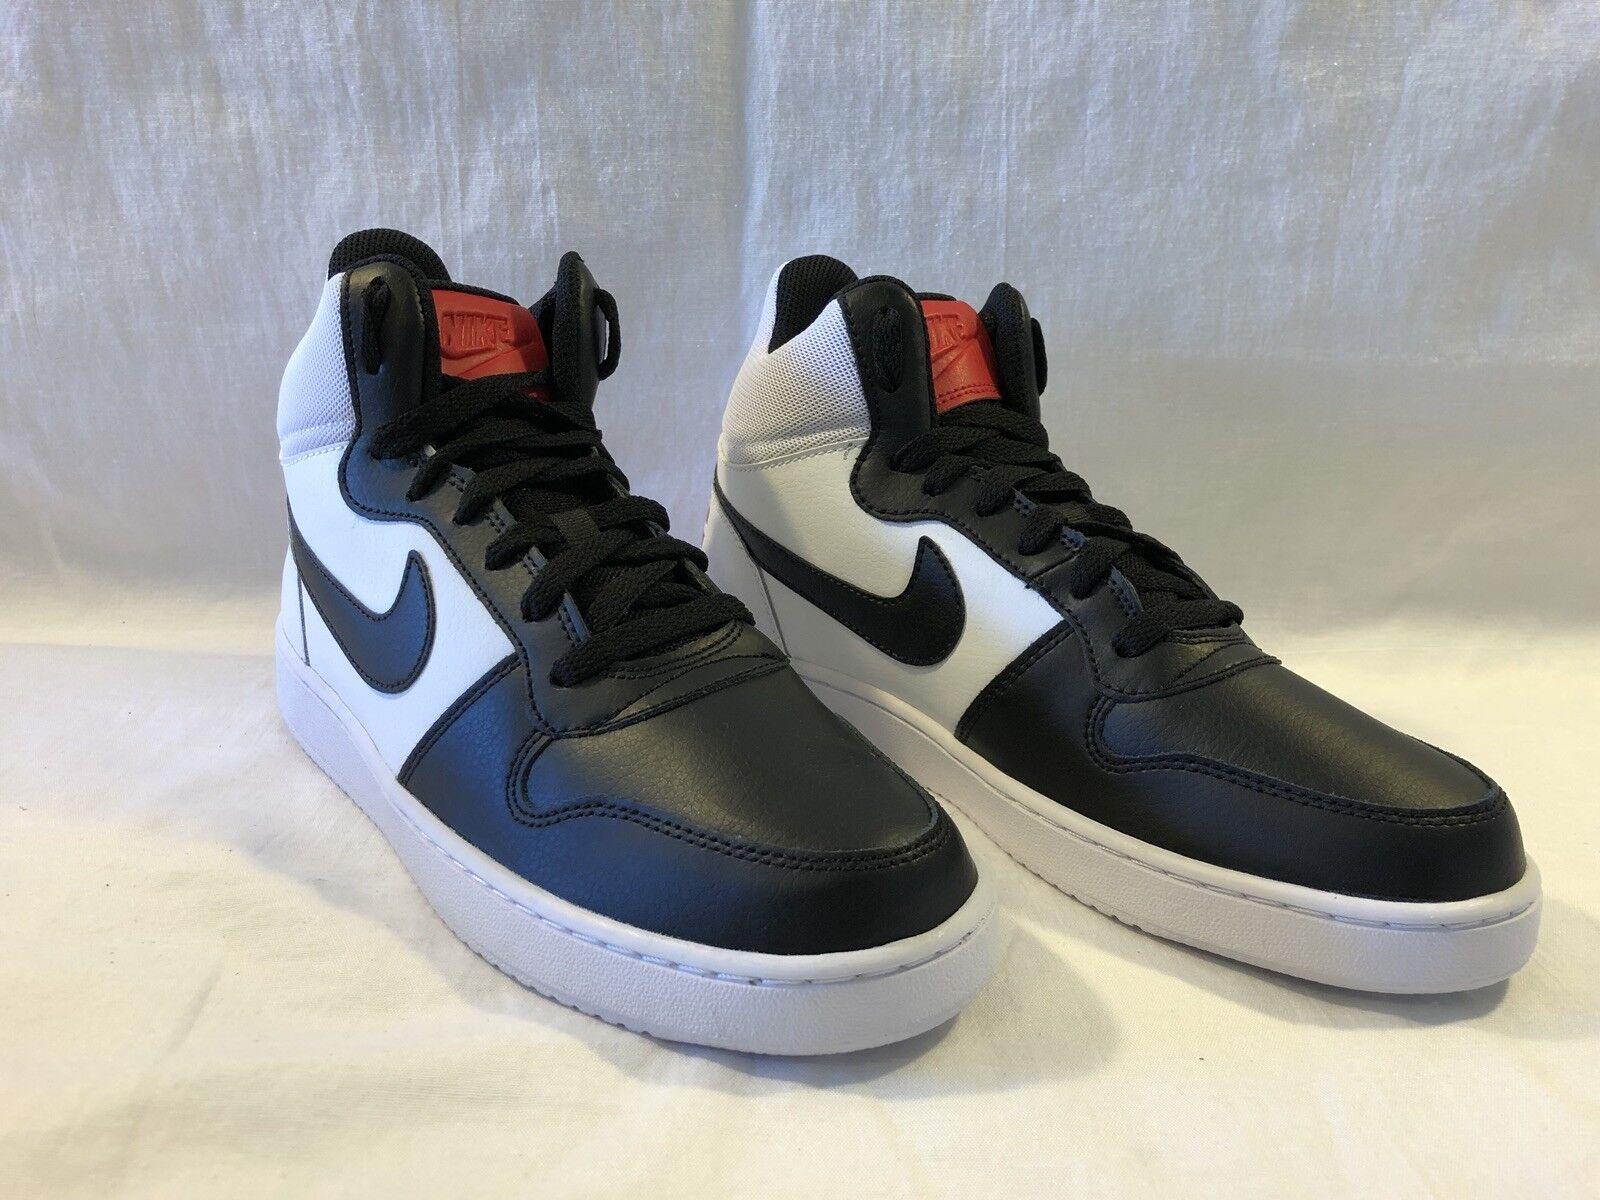 Womens Nike Court Court Court Bgoldugh Mid 9 Retro Black Red White 844906-100 Blazer Jordan 177716